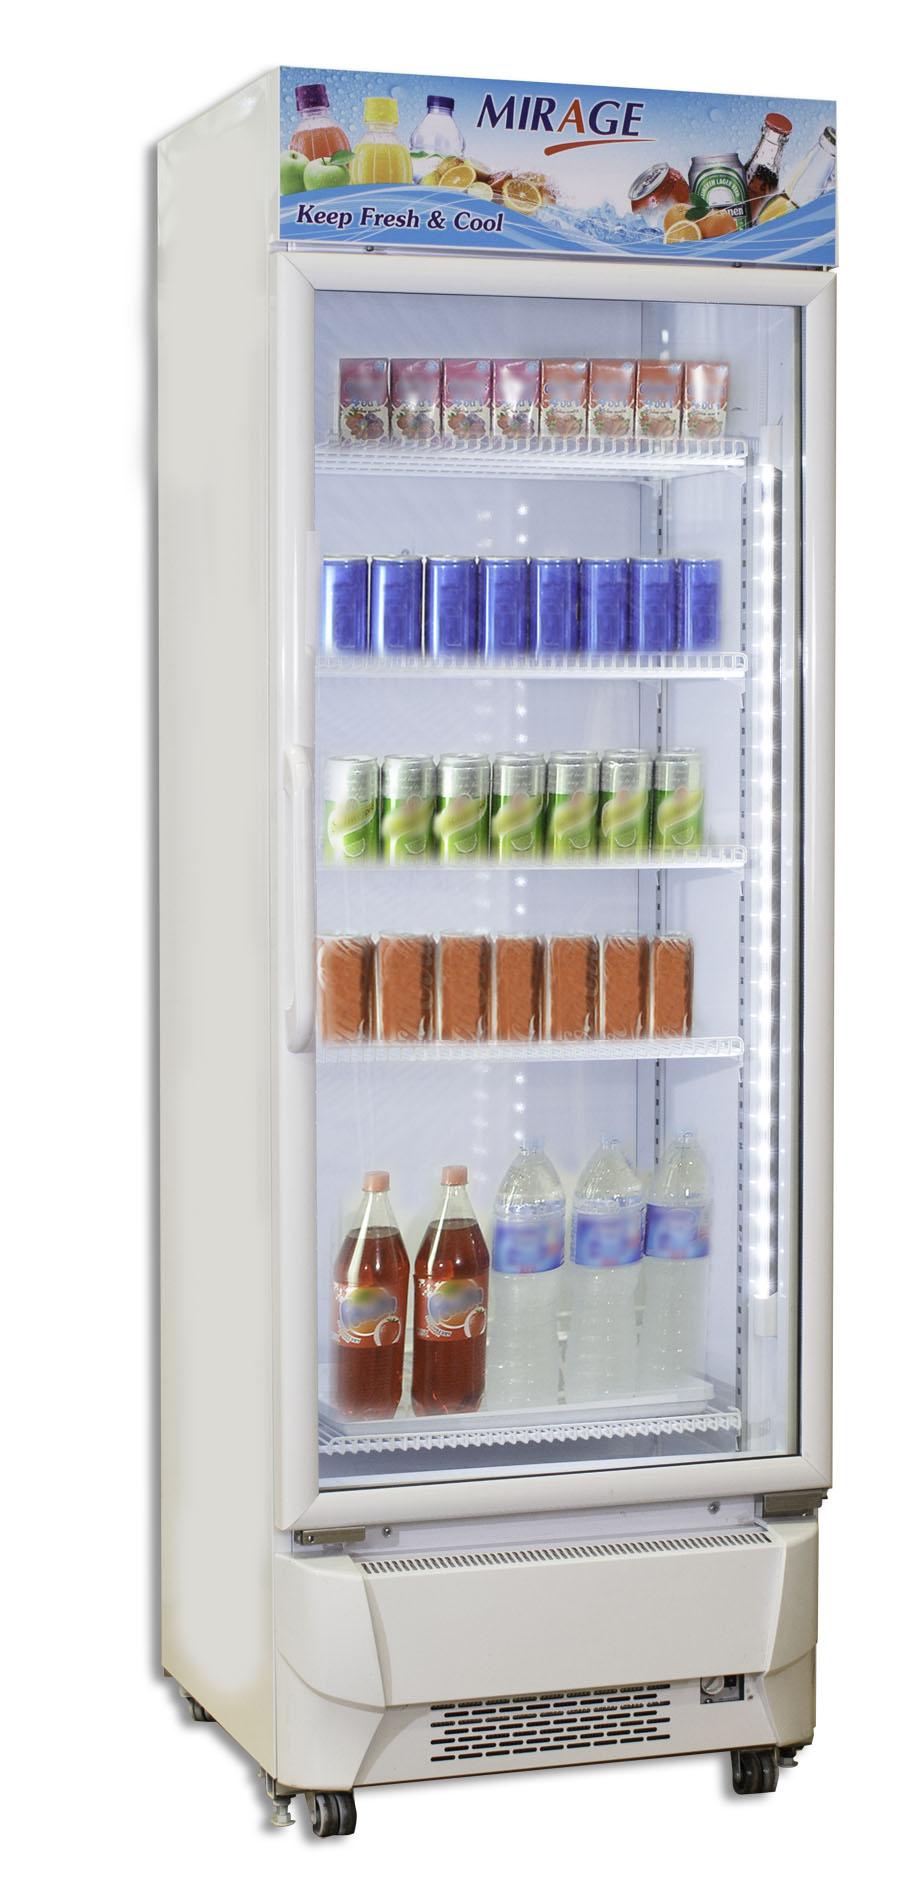 Mirage ตู้แช่เย็น / เครื่องดื่ม 1 ประตู จุ 15.9 คิว/460 ลิตร รุ่น BC159